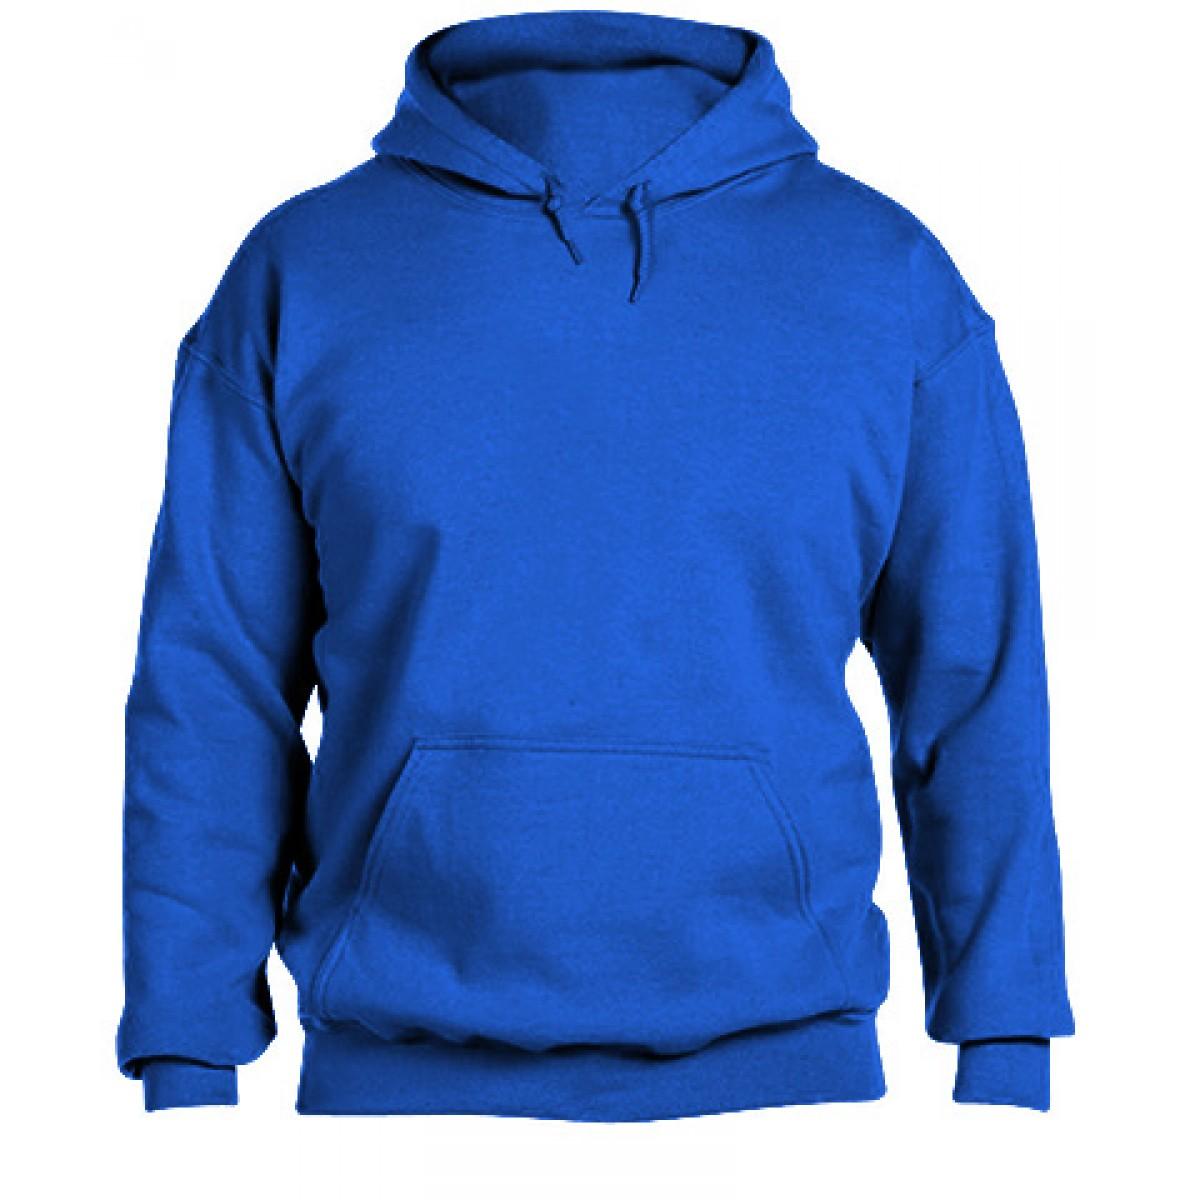 Hooded Sweatshirt 50/50 Heavy Blend-3XL